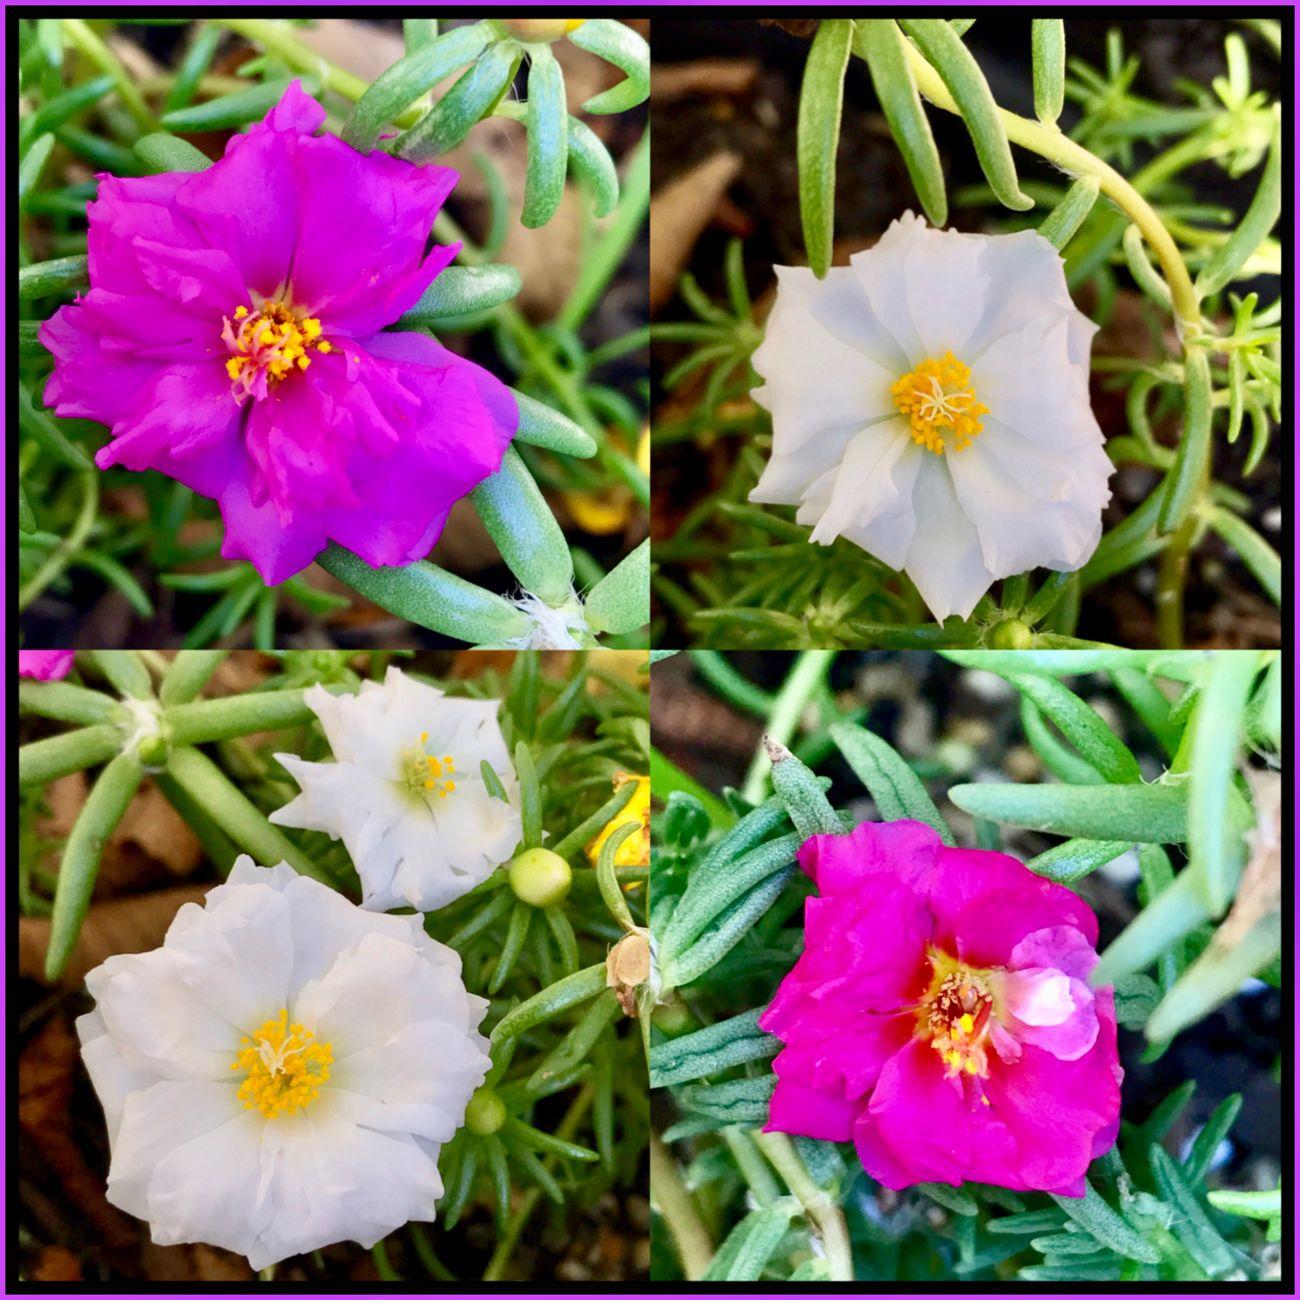 My flower's 🌺🍃🌸 Flowers Flower. Flowercollage. Flower Lovers Flowers_collection Flowers Of EyeEm Flowers Of The World. Flower Photography Flowers,Plants & Garden Floweroftheday Flowering 🌺🍃🌸